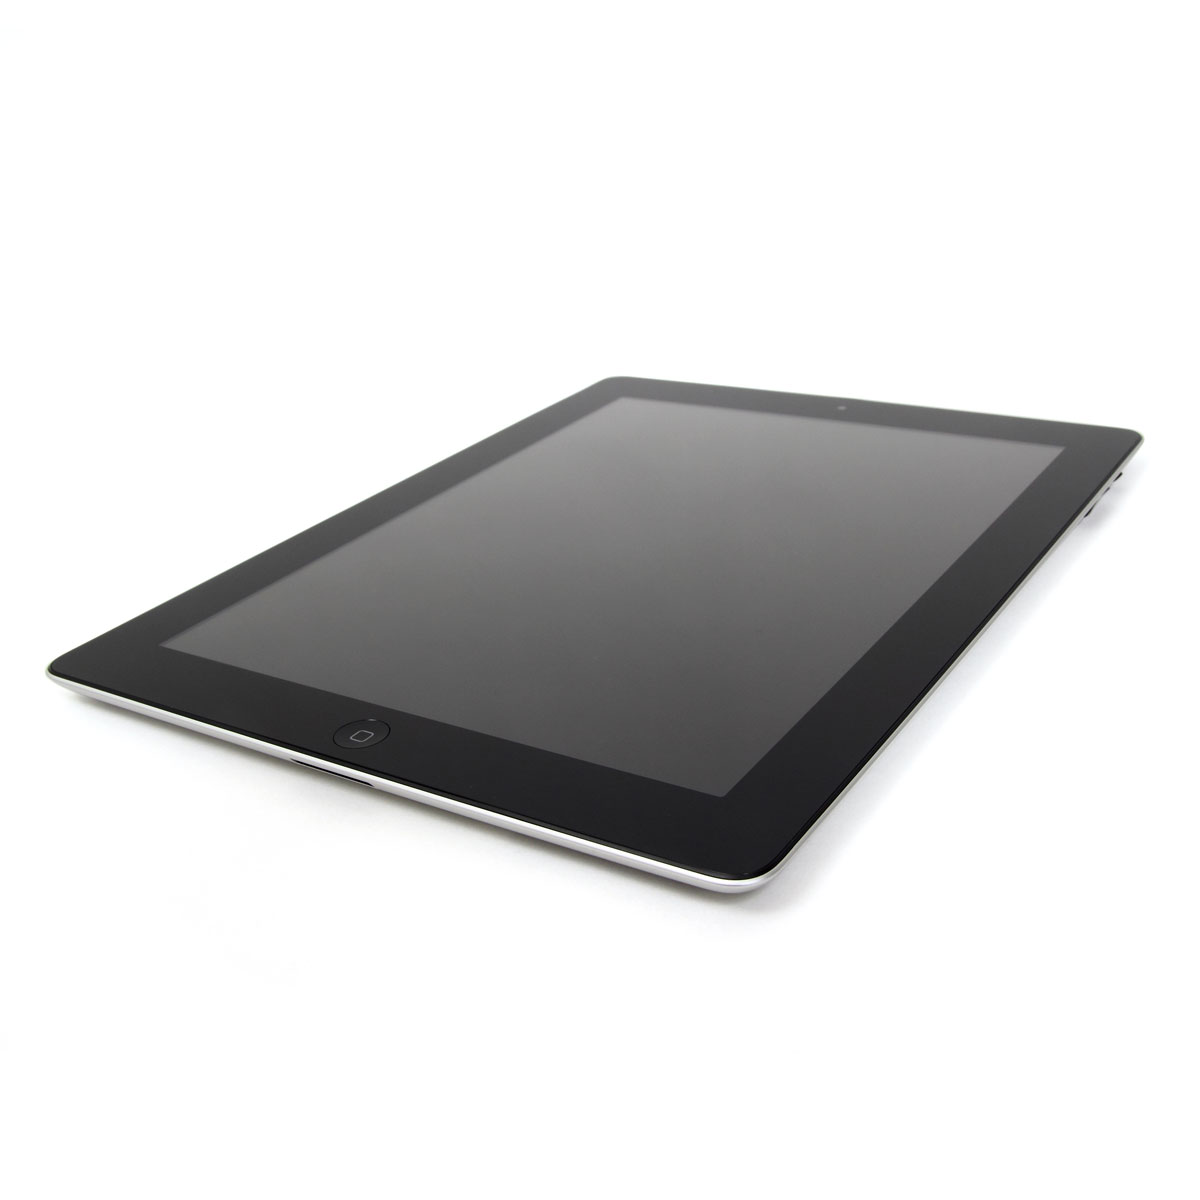 "Tablette tactile Apple iPad 2 Wi-Fi 32 Go Noir Tablette Internet - Apple A5 1 GHz 512 Mo 32 Go 9.7"" LED tactile Wi-Fi N/Bluetooth Webcam iOS 4"